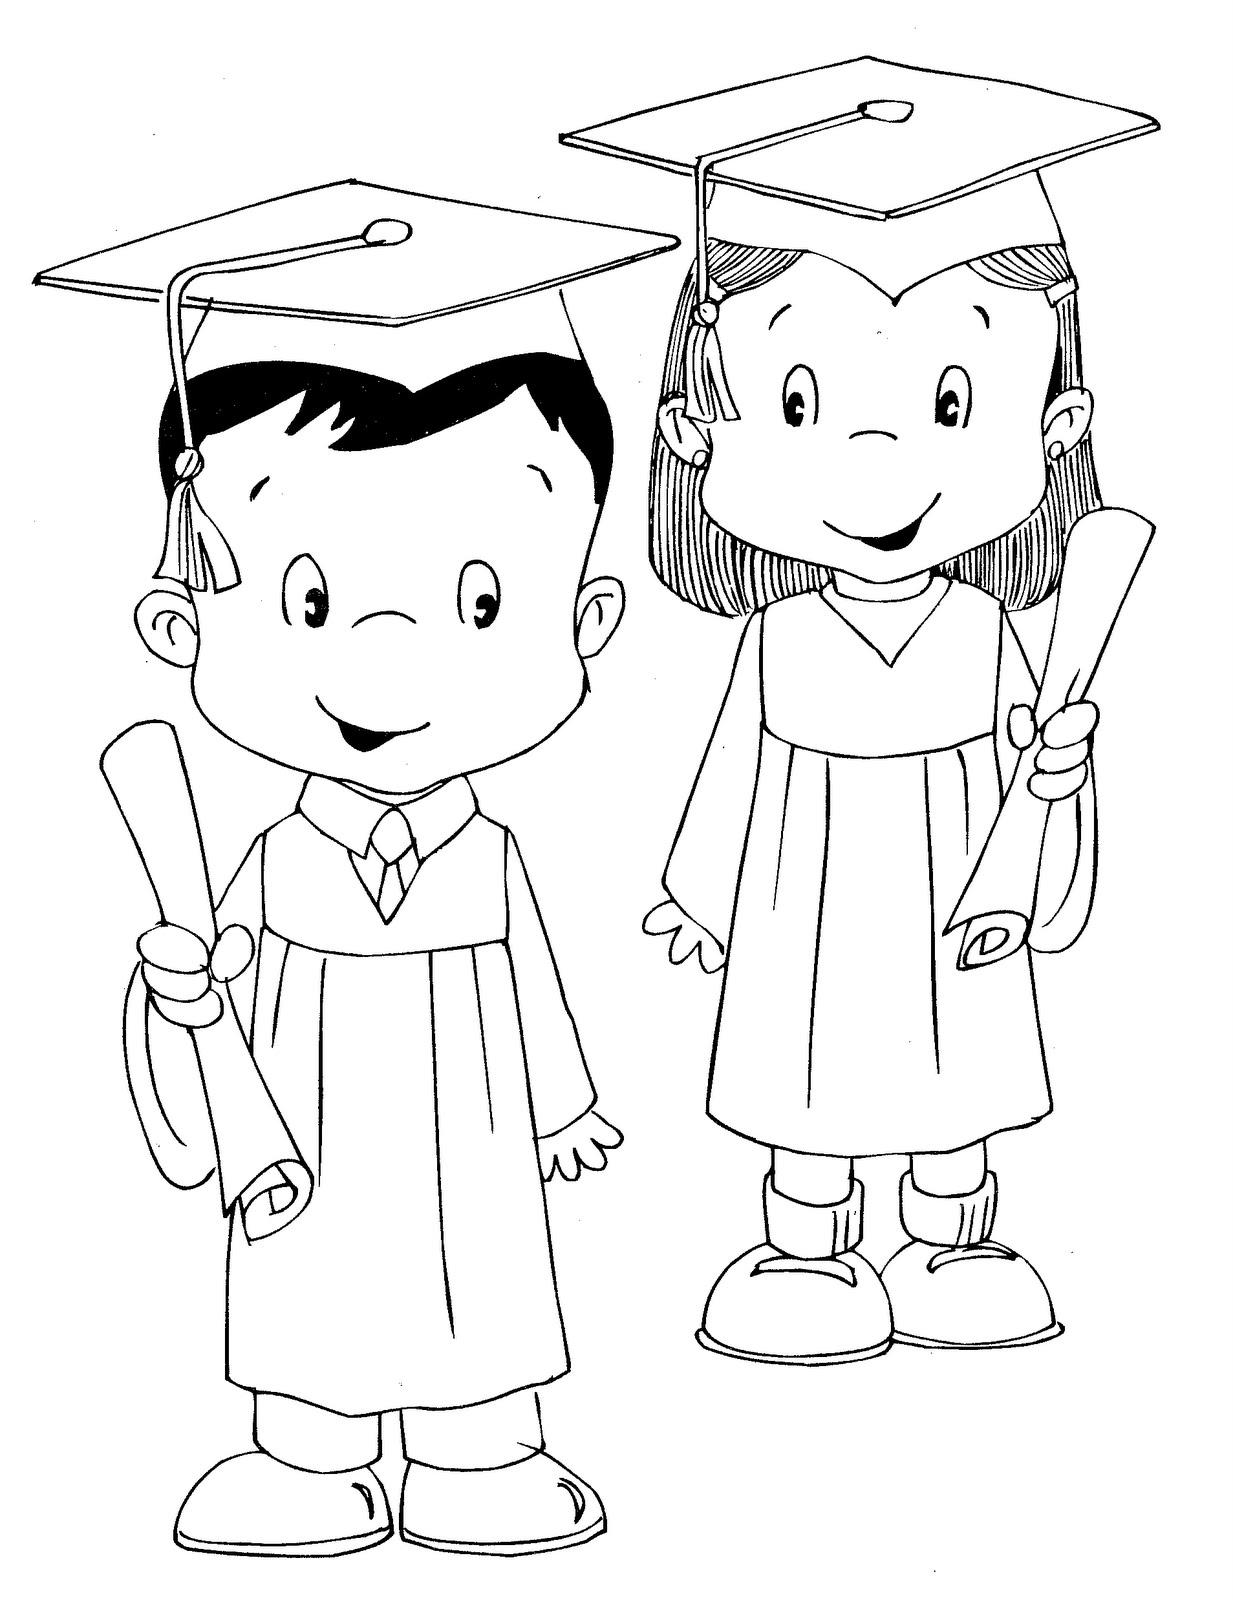 Imagenes Dibujos De Graduacion